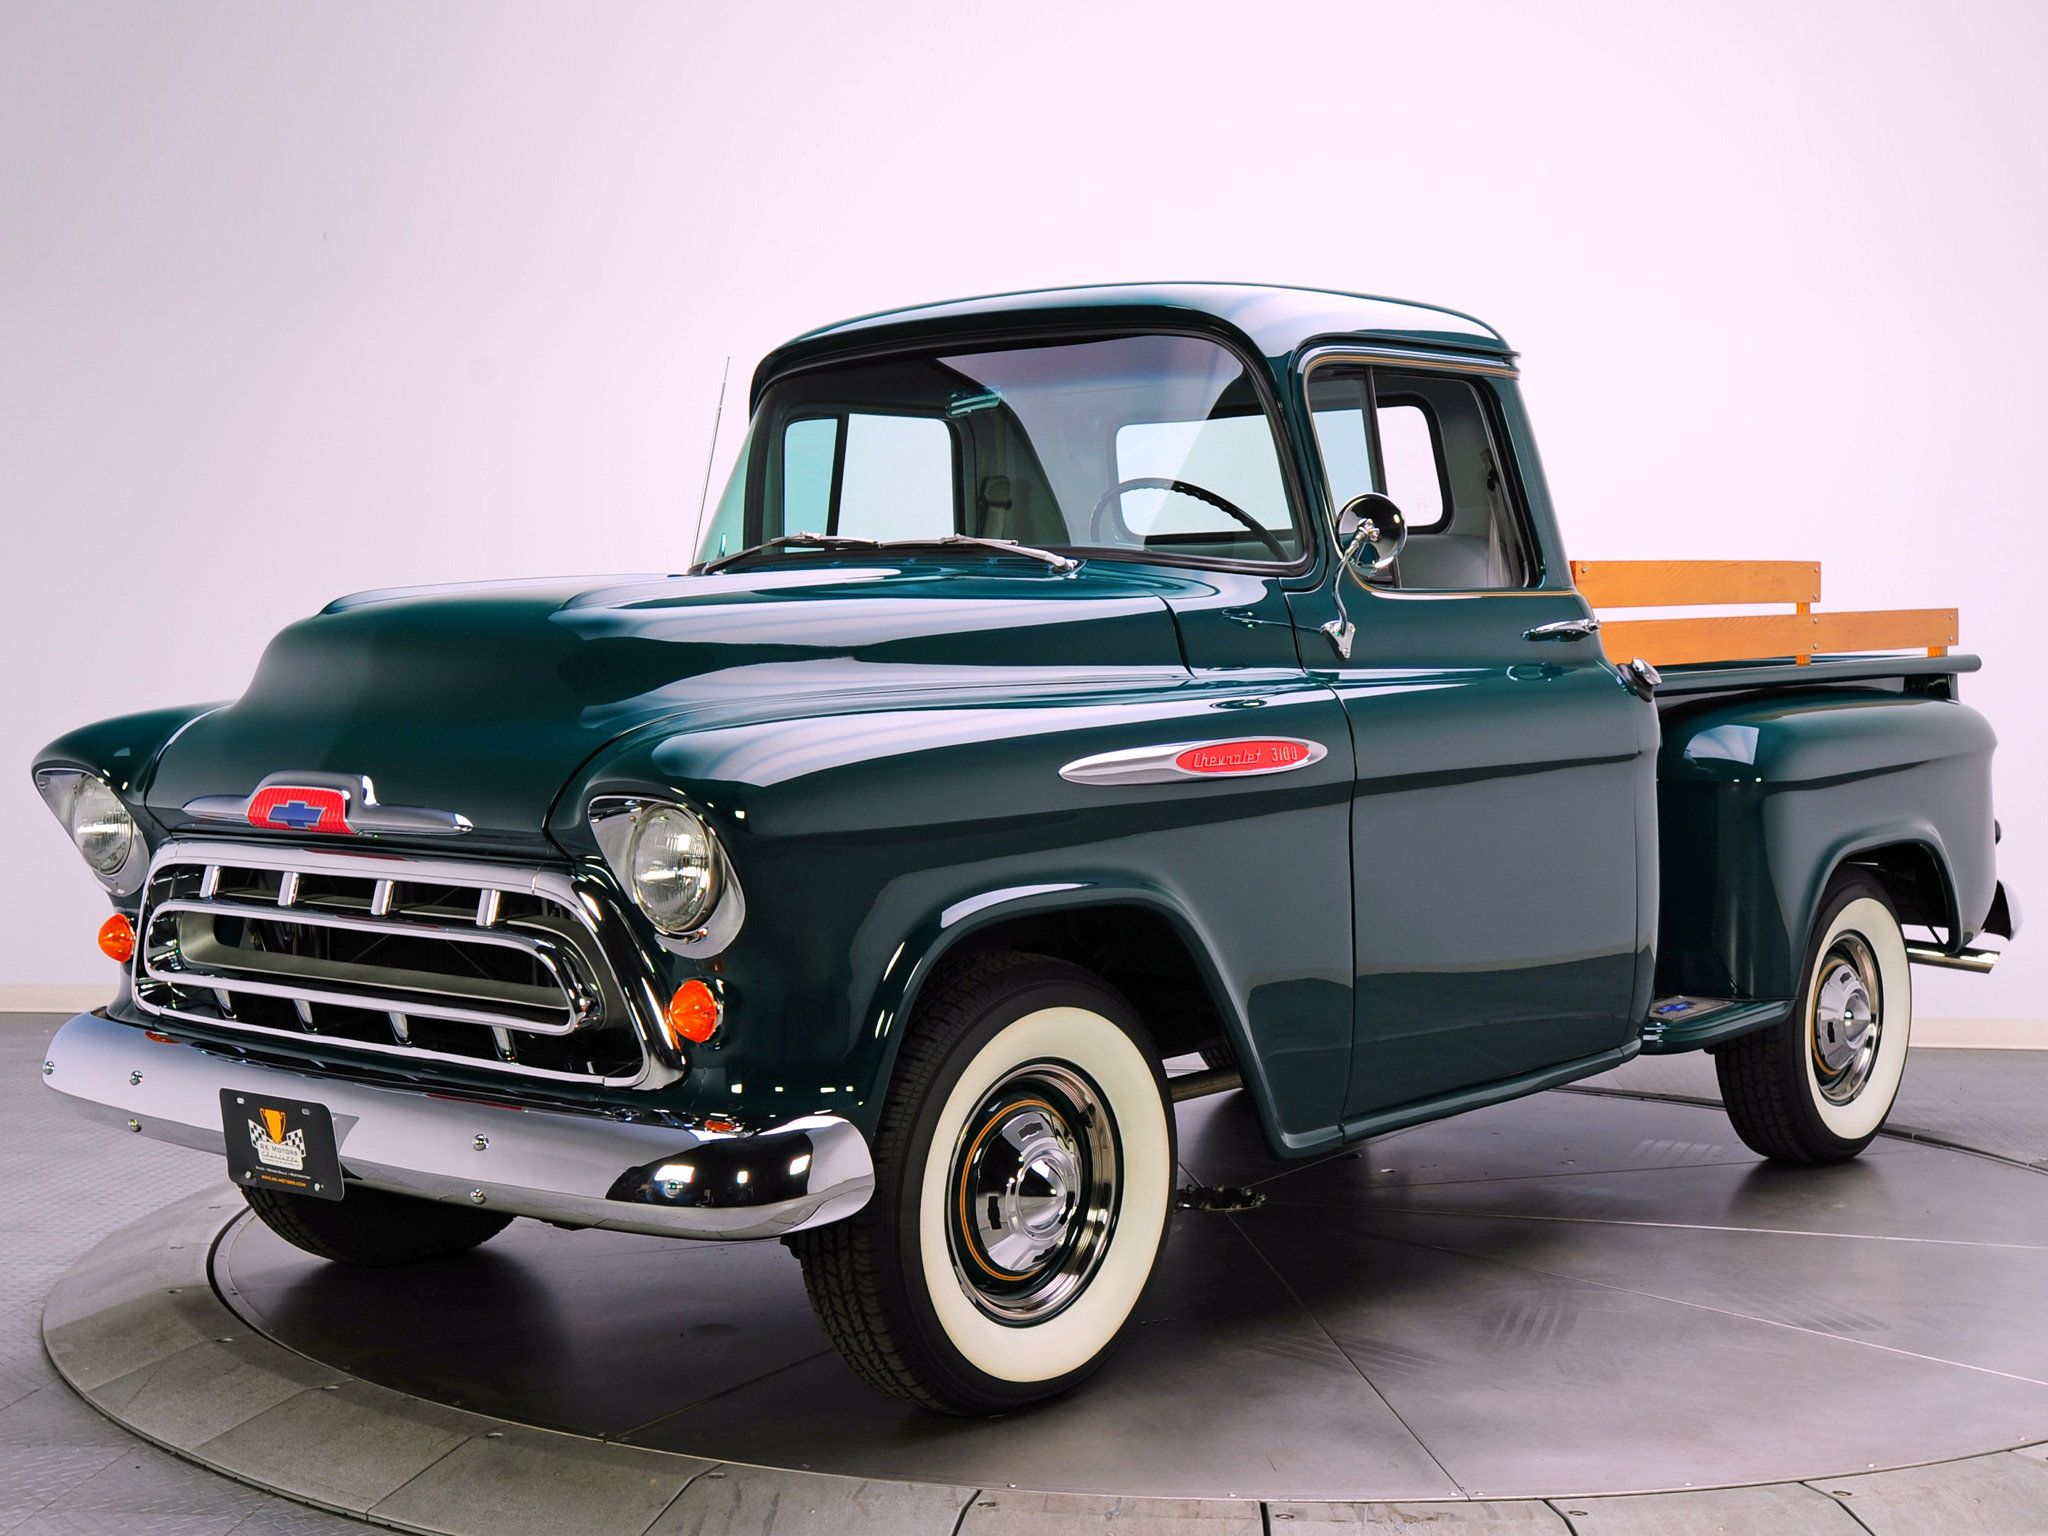 una de las pick up m s hermosas la chevy 3100 1957 the wheels chevy trucks trucks chevrolet. Black Bedroom Furniture Sets. Home Design Ideas